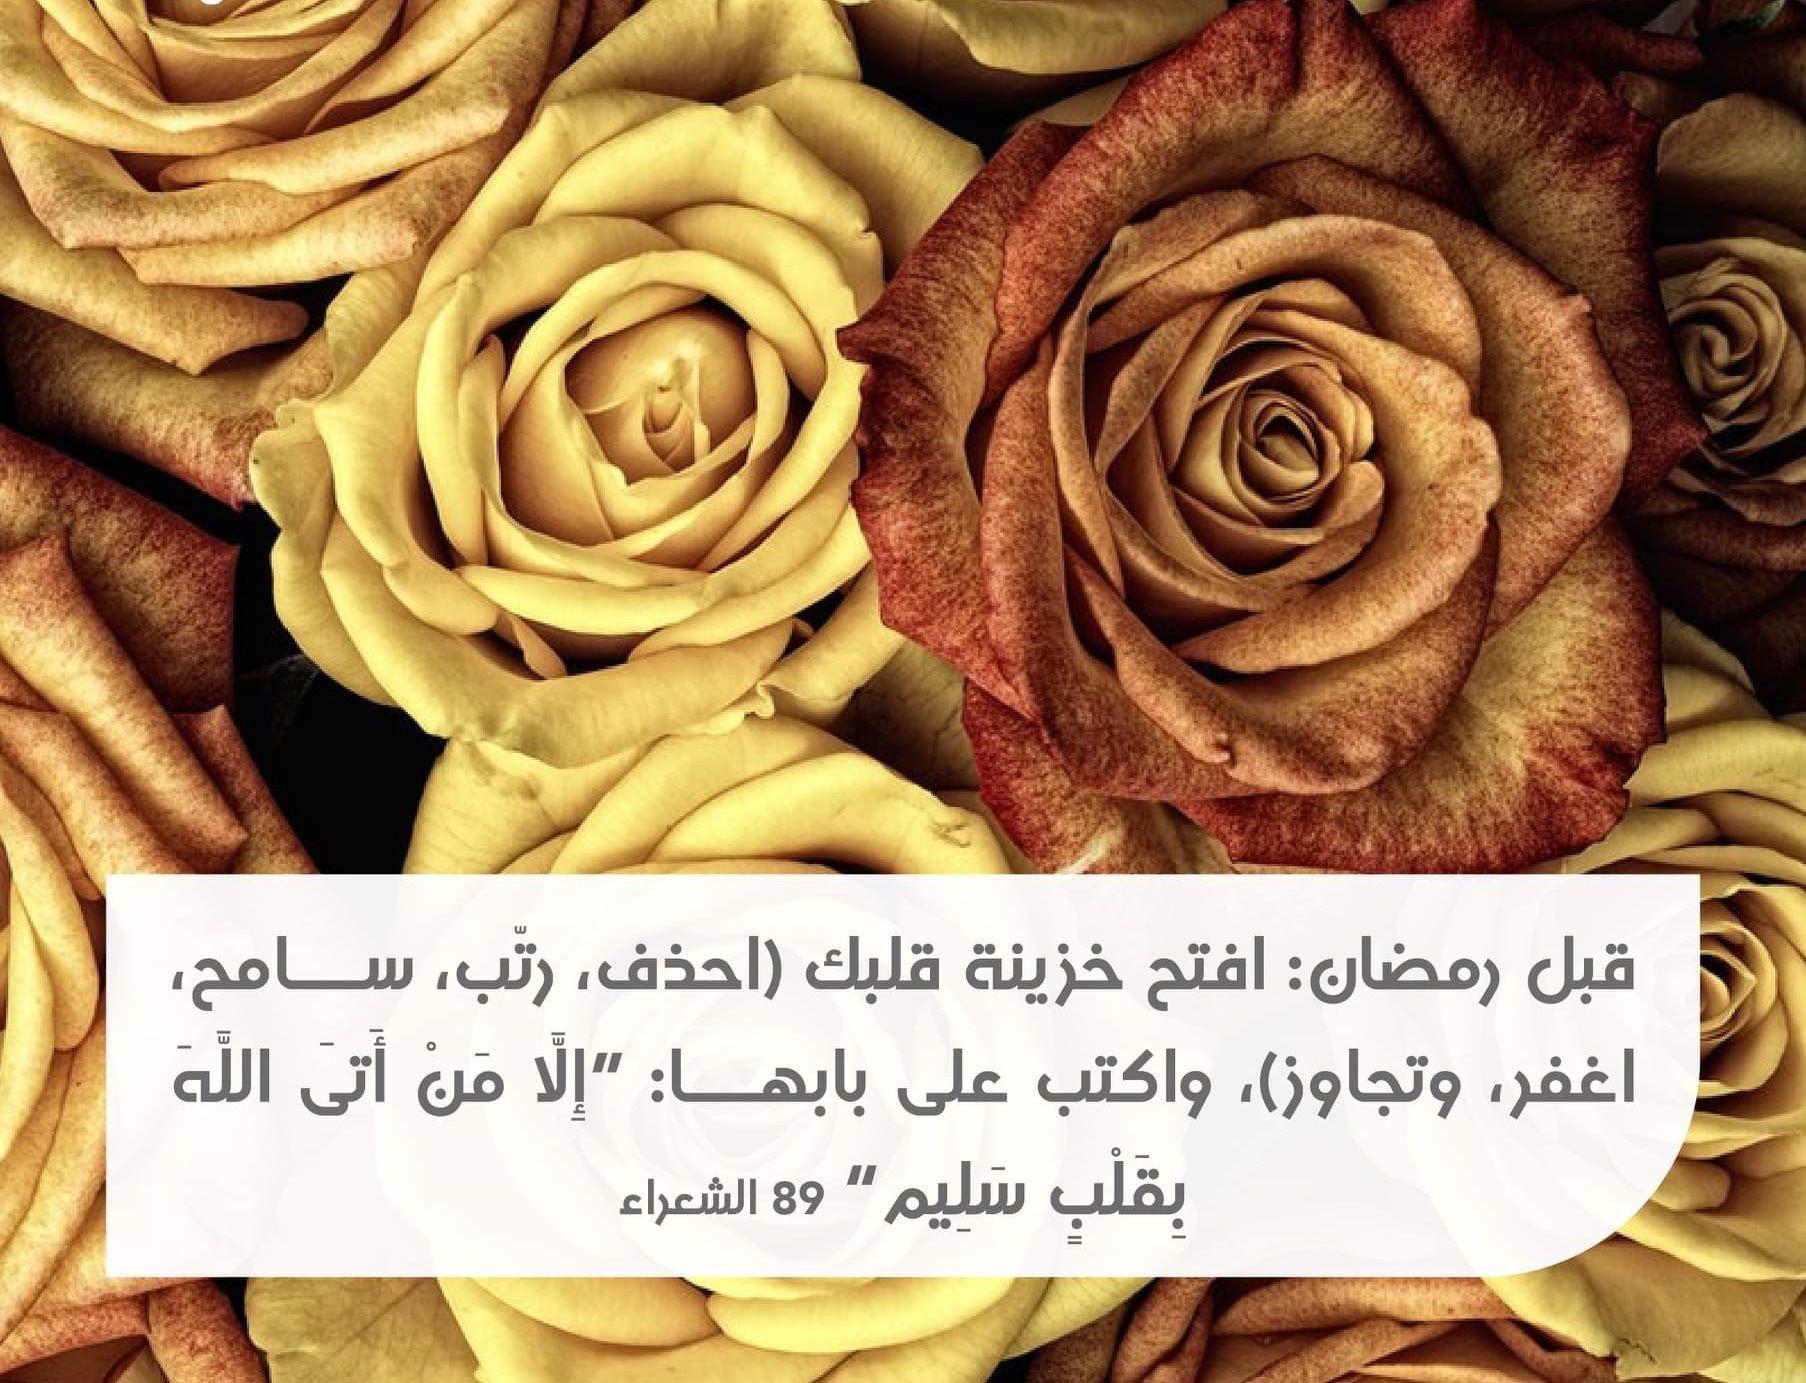 Pin By Shh5 On رمضان كريم Ramadan Kareem Qoutes Plants Rose